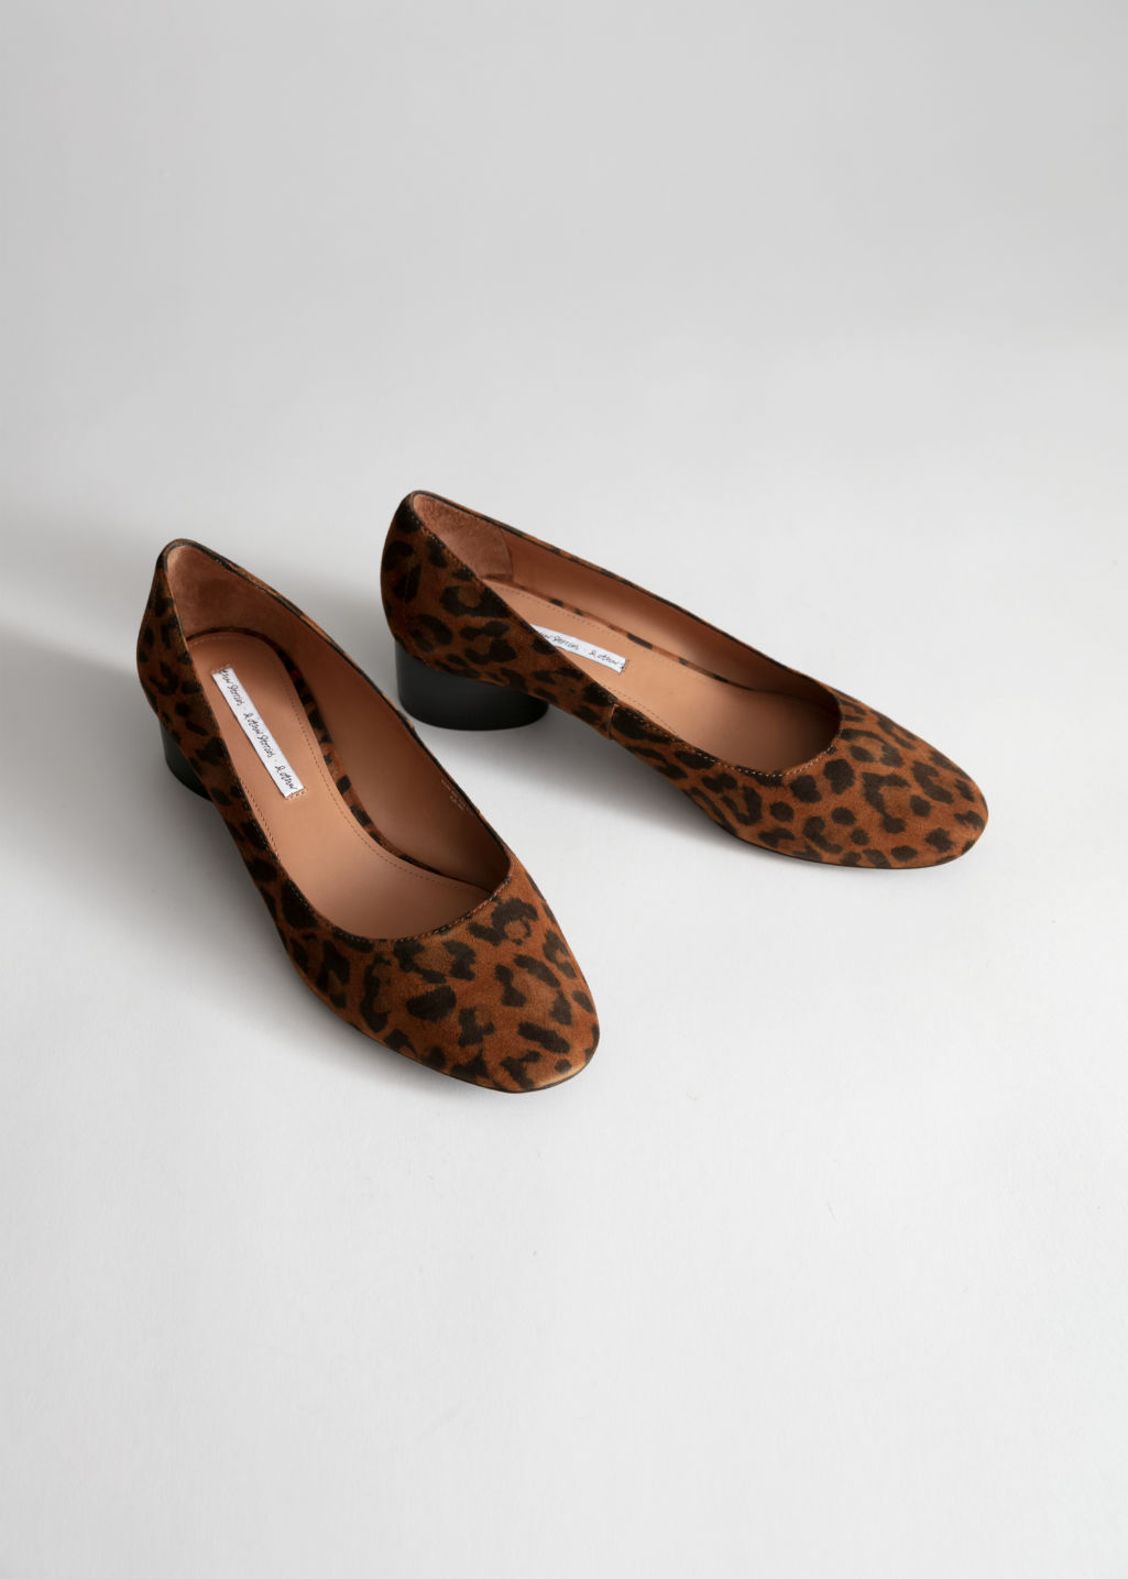 0dc7224f04be Suede Ballerina Pumps - Leopard - Pumps -   Other Stories